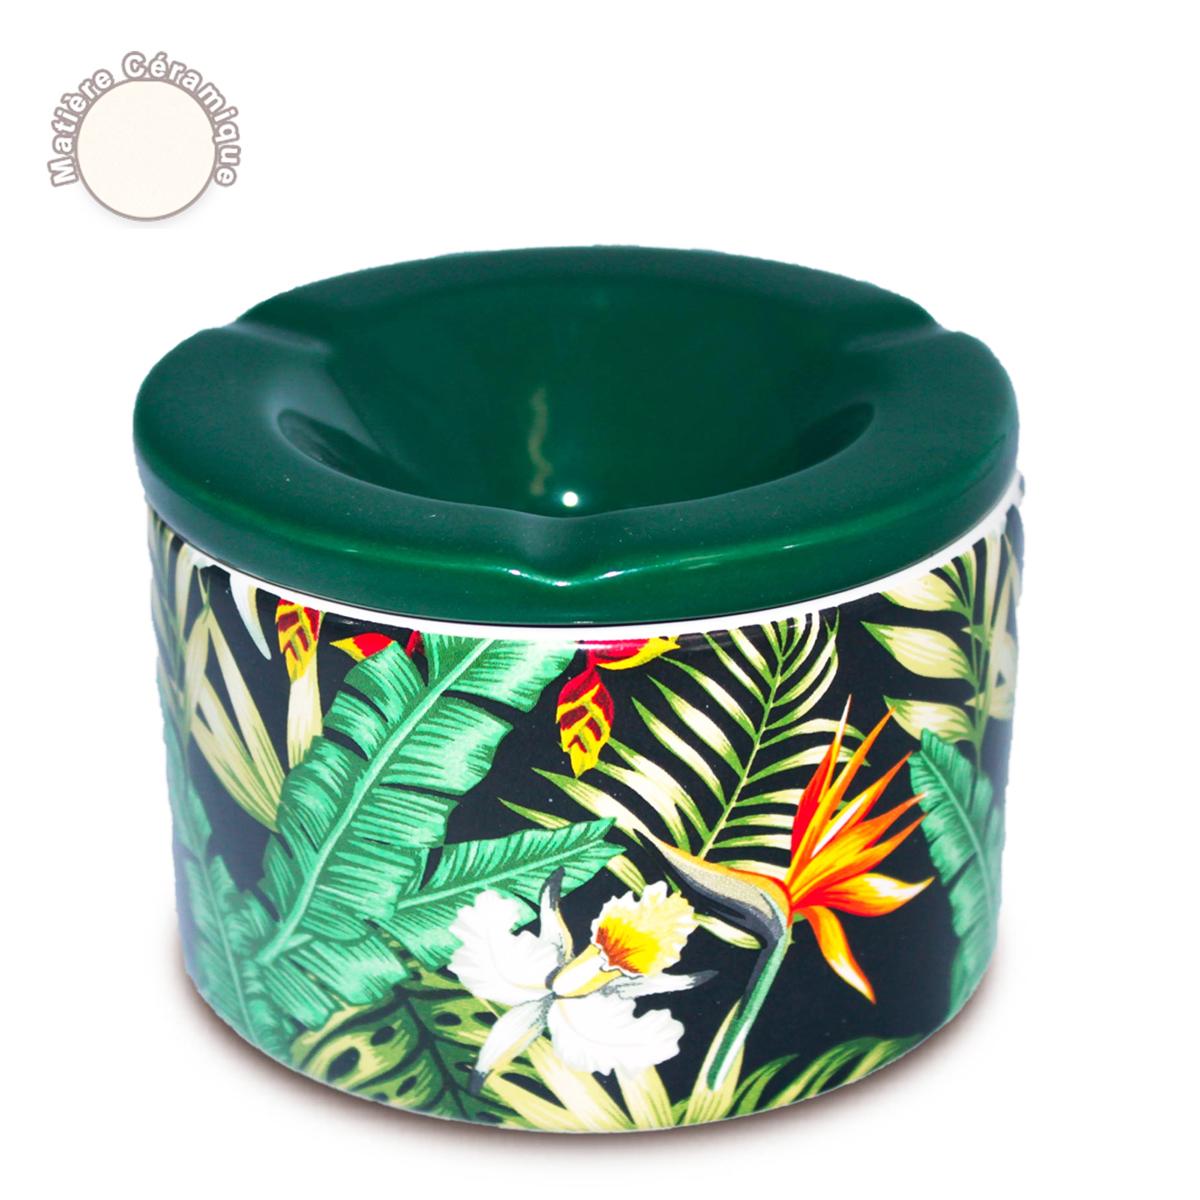 Cendrier marocain céramique \'Tropical\' vert - 10x7 cm - [A0560]